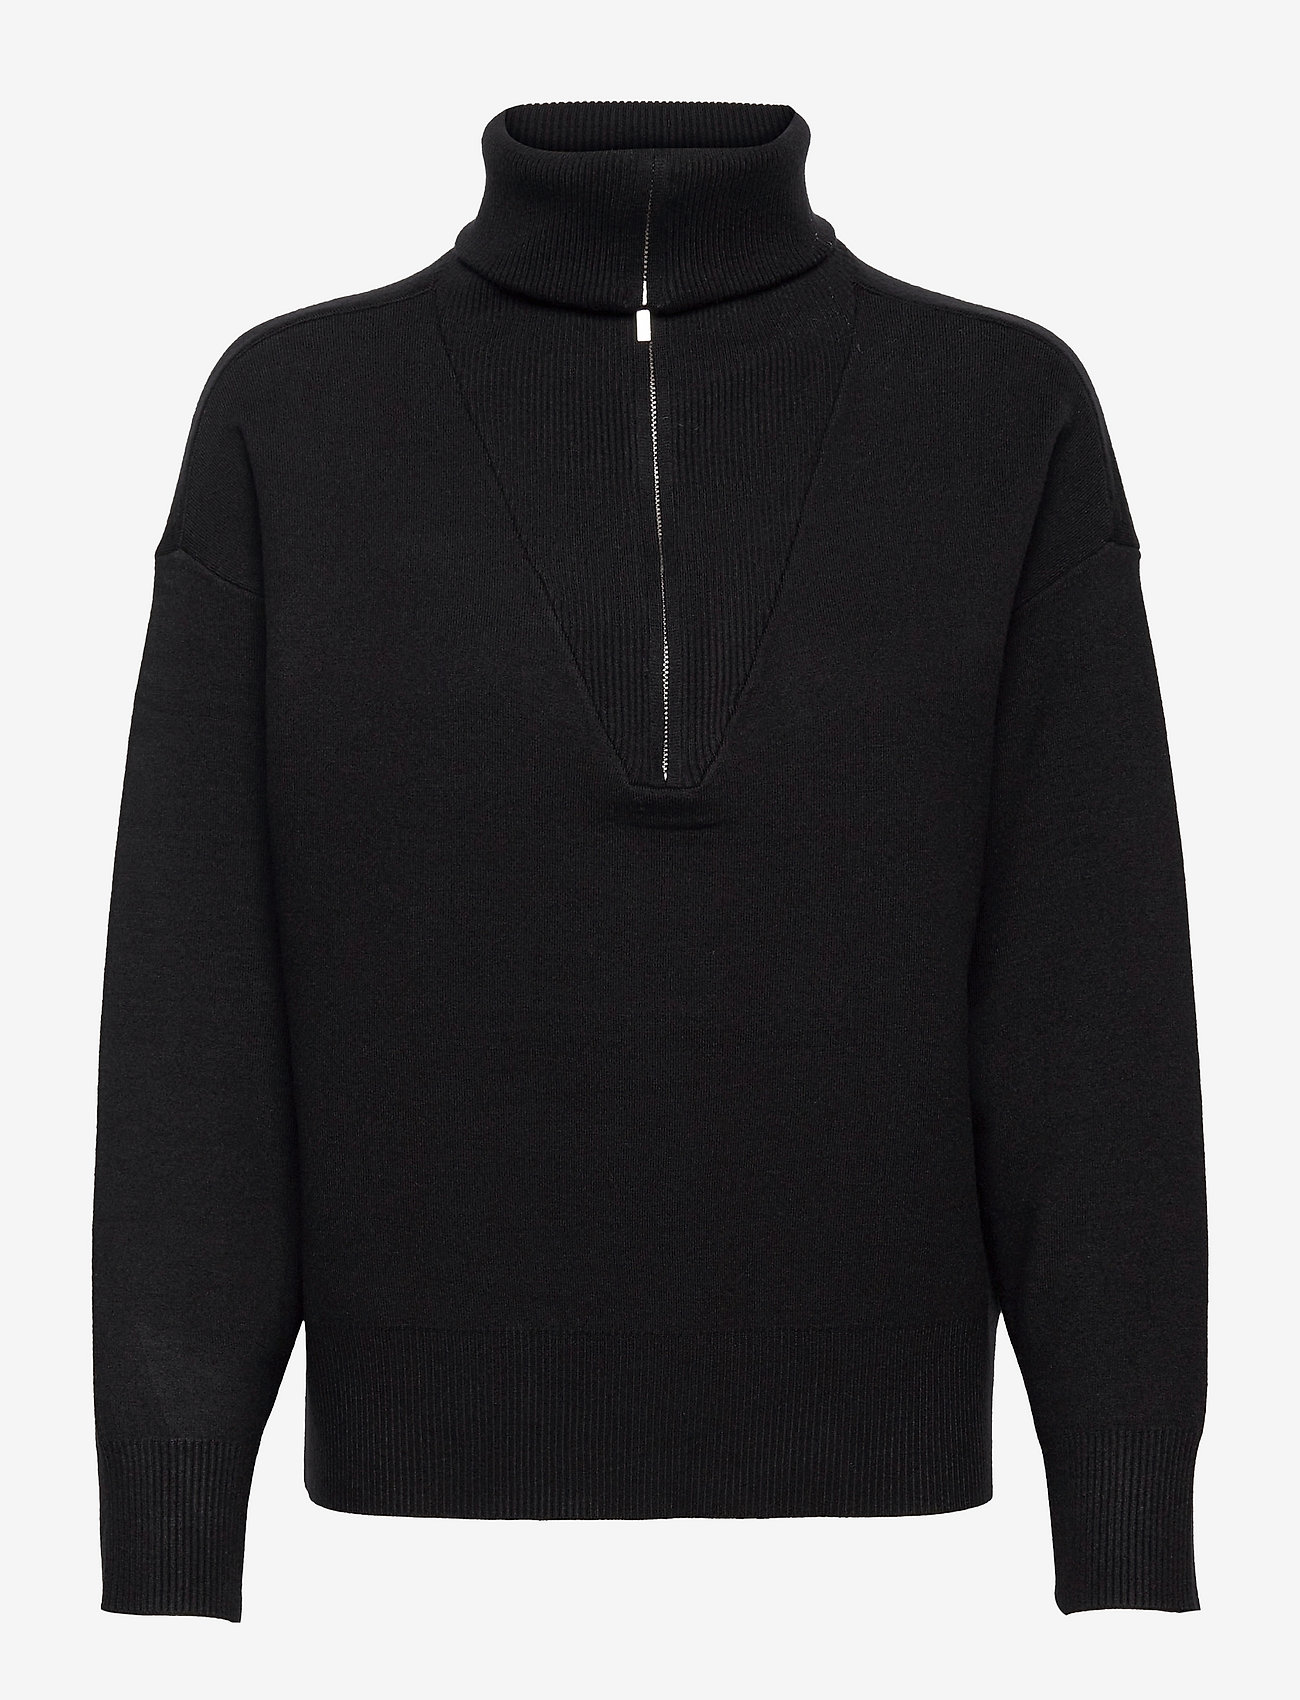 Gestuz - TalliGZ zipper pullover - trøjer - black - 0